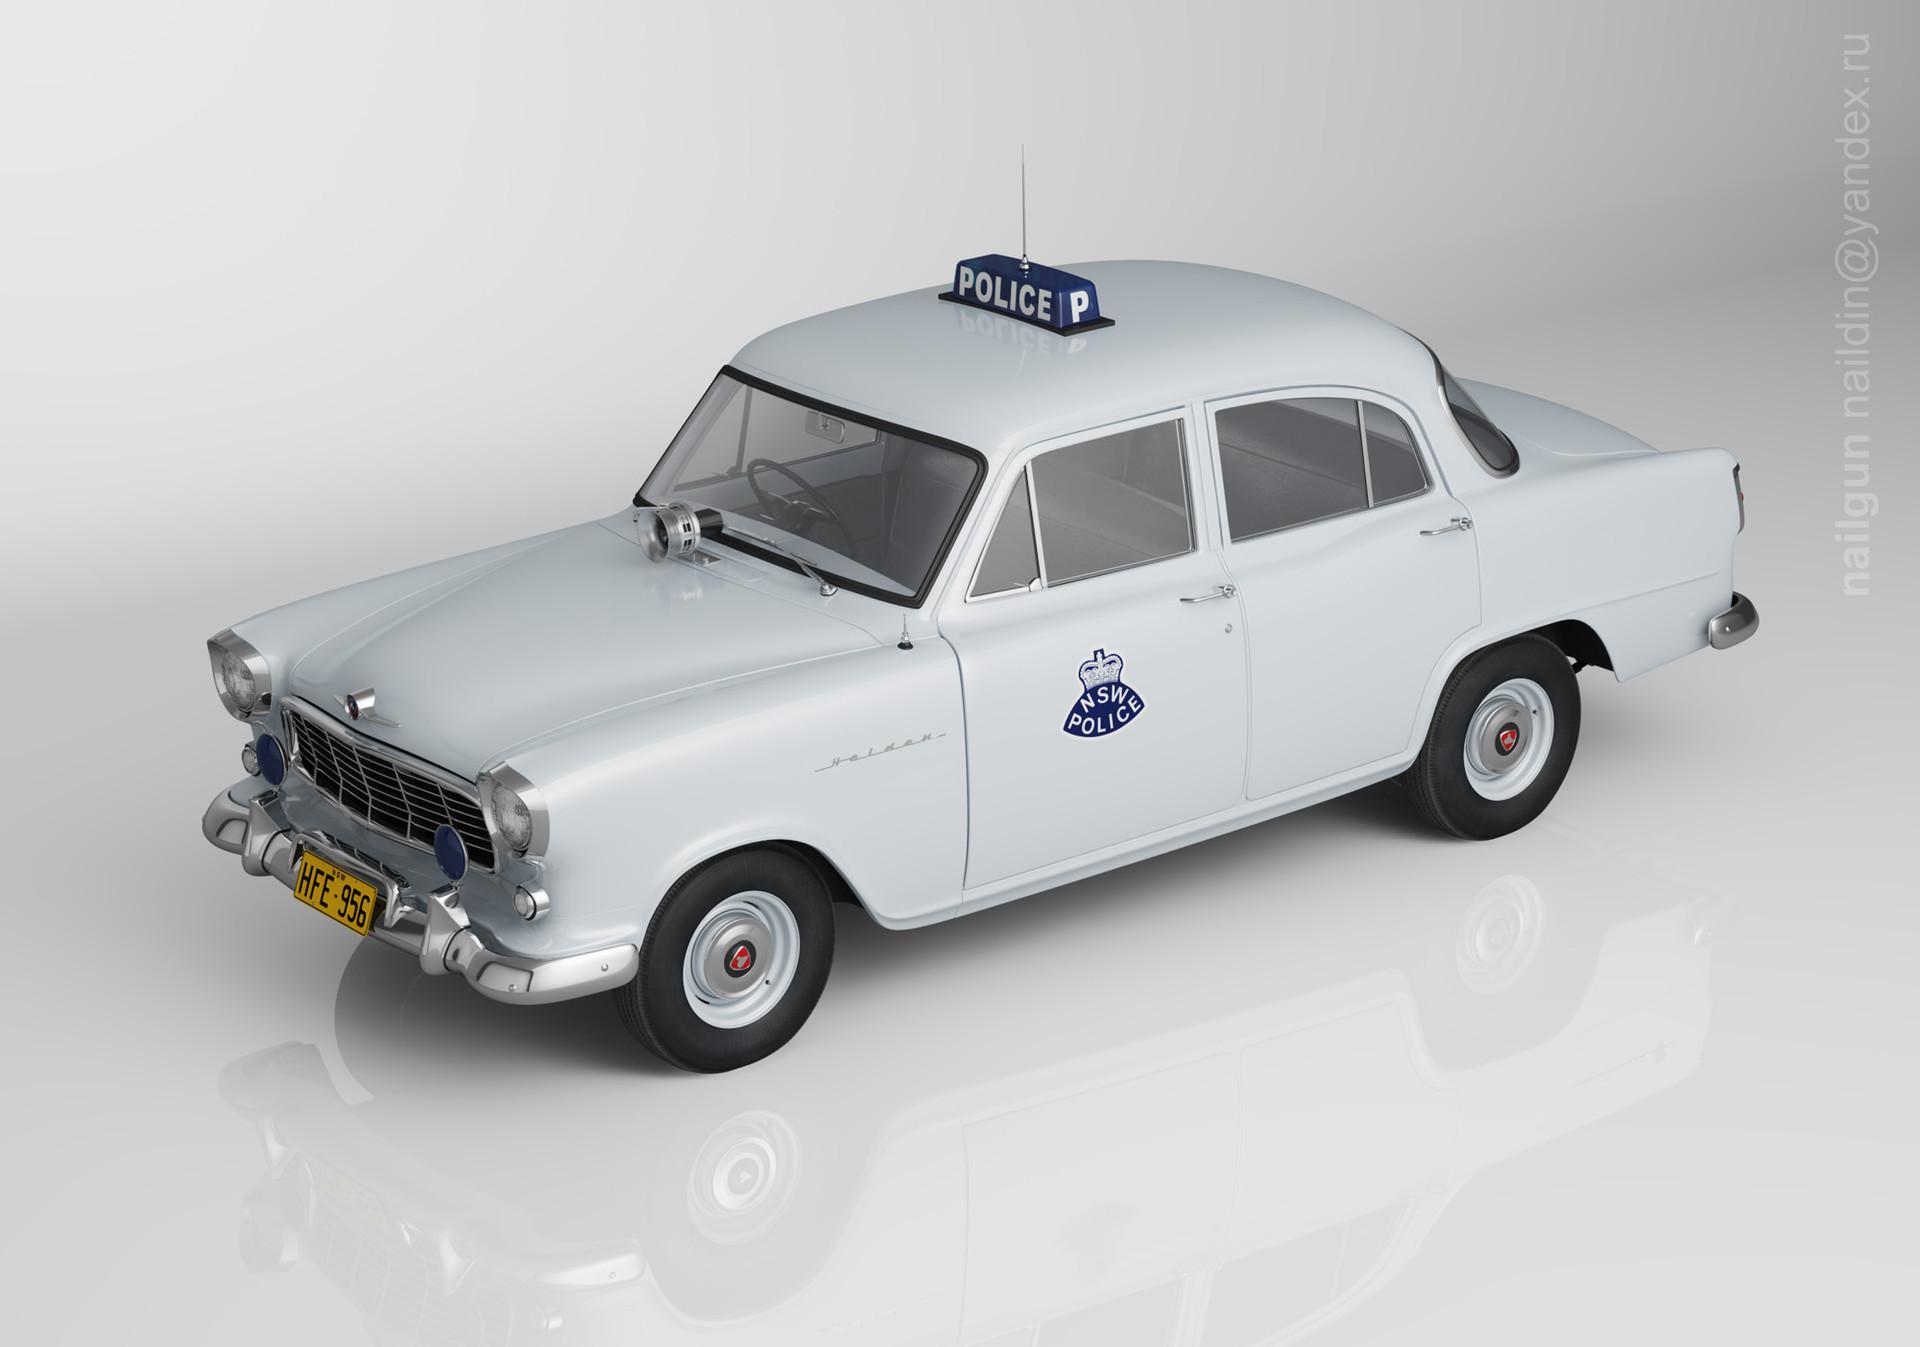 Nail khusnutdinov pwc 010 000 holden fe police miniature